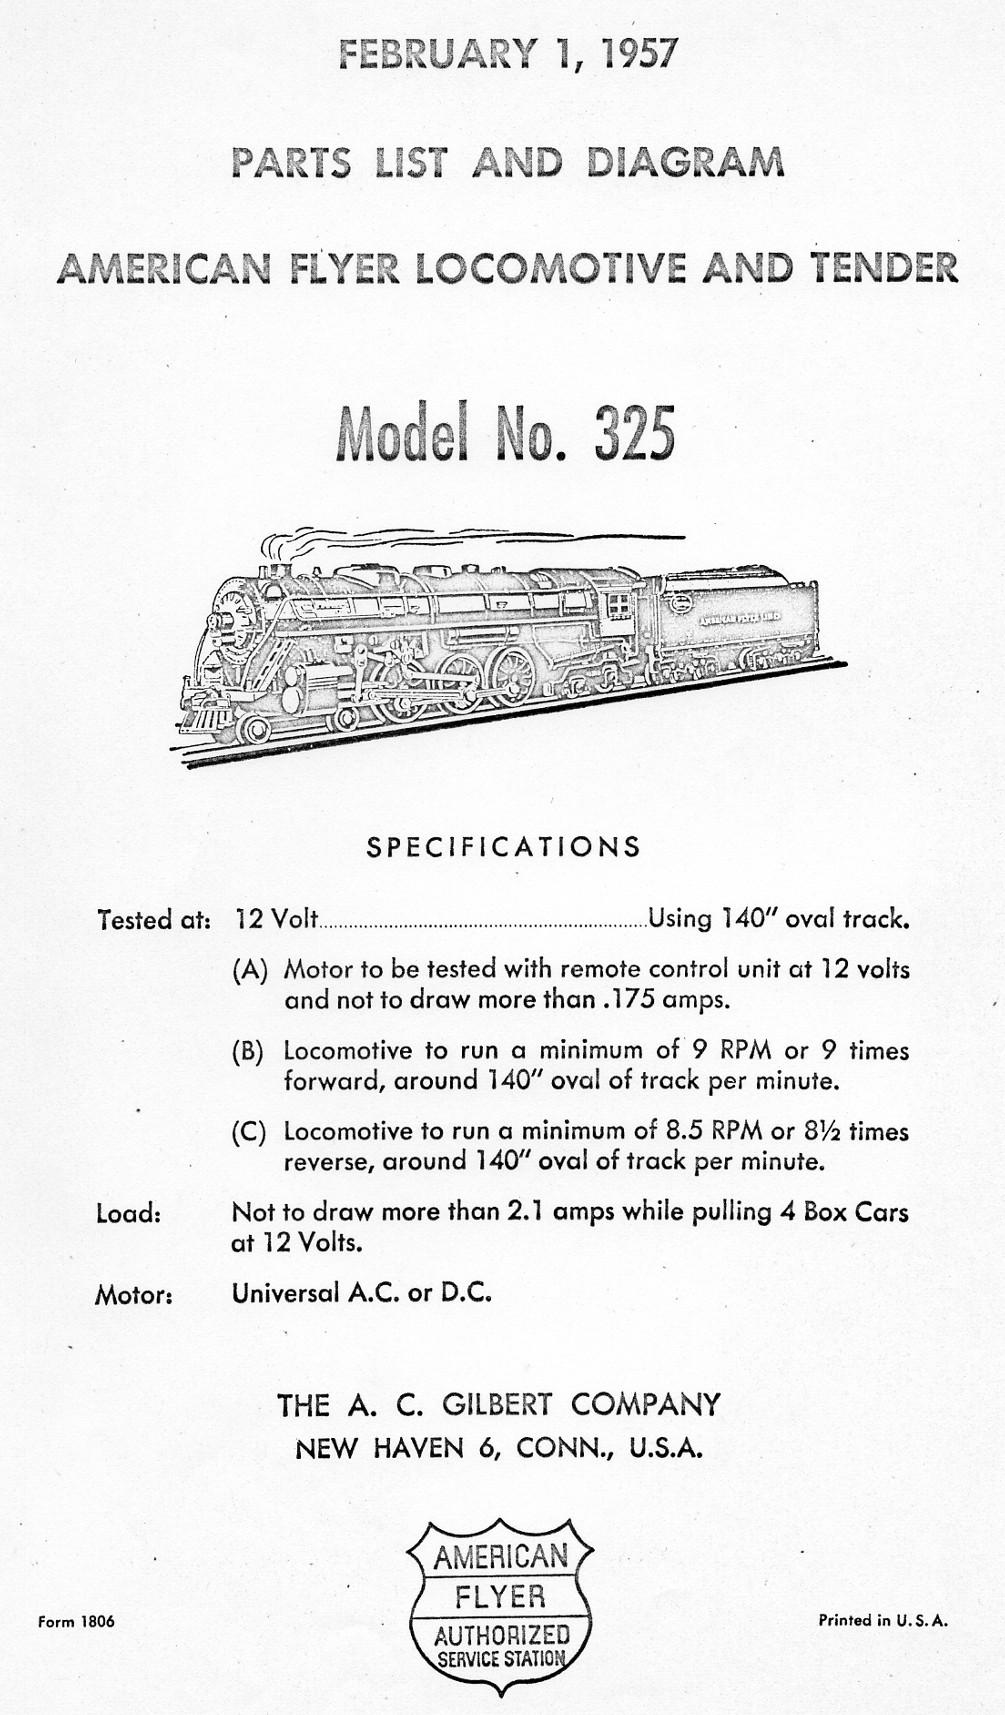 American Flyer Locomotive 325 & K325 Parts List & Diagram Parts List and Diagram - Page 1